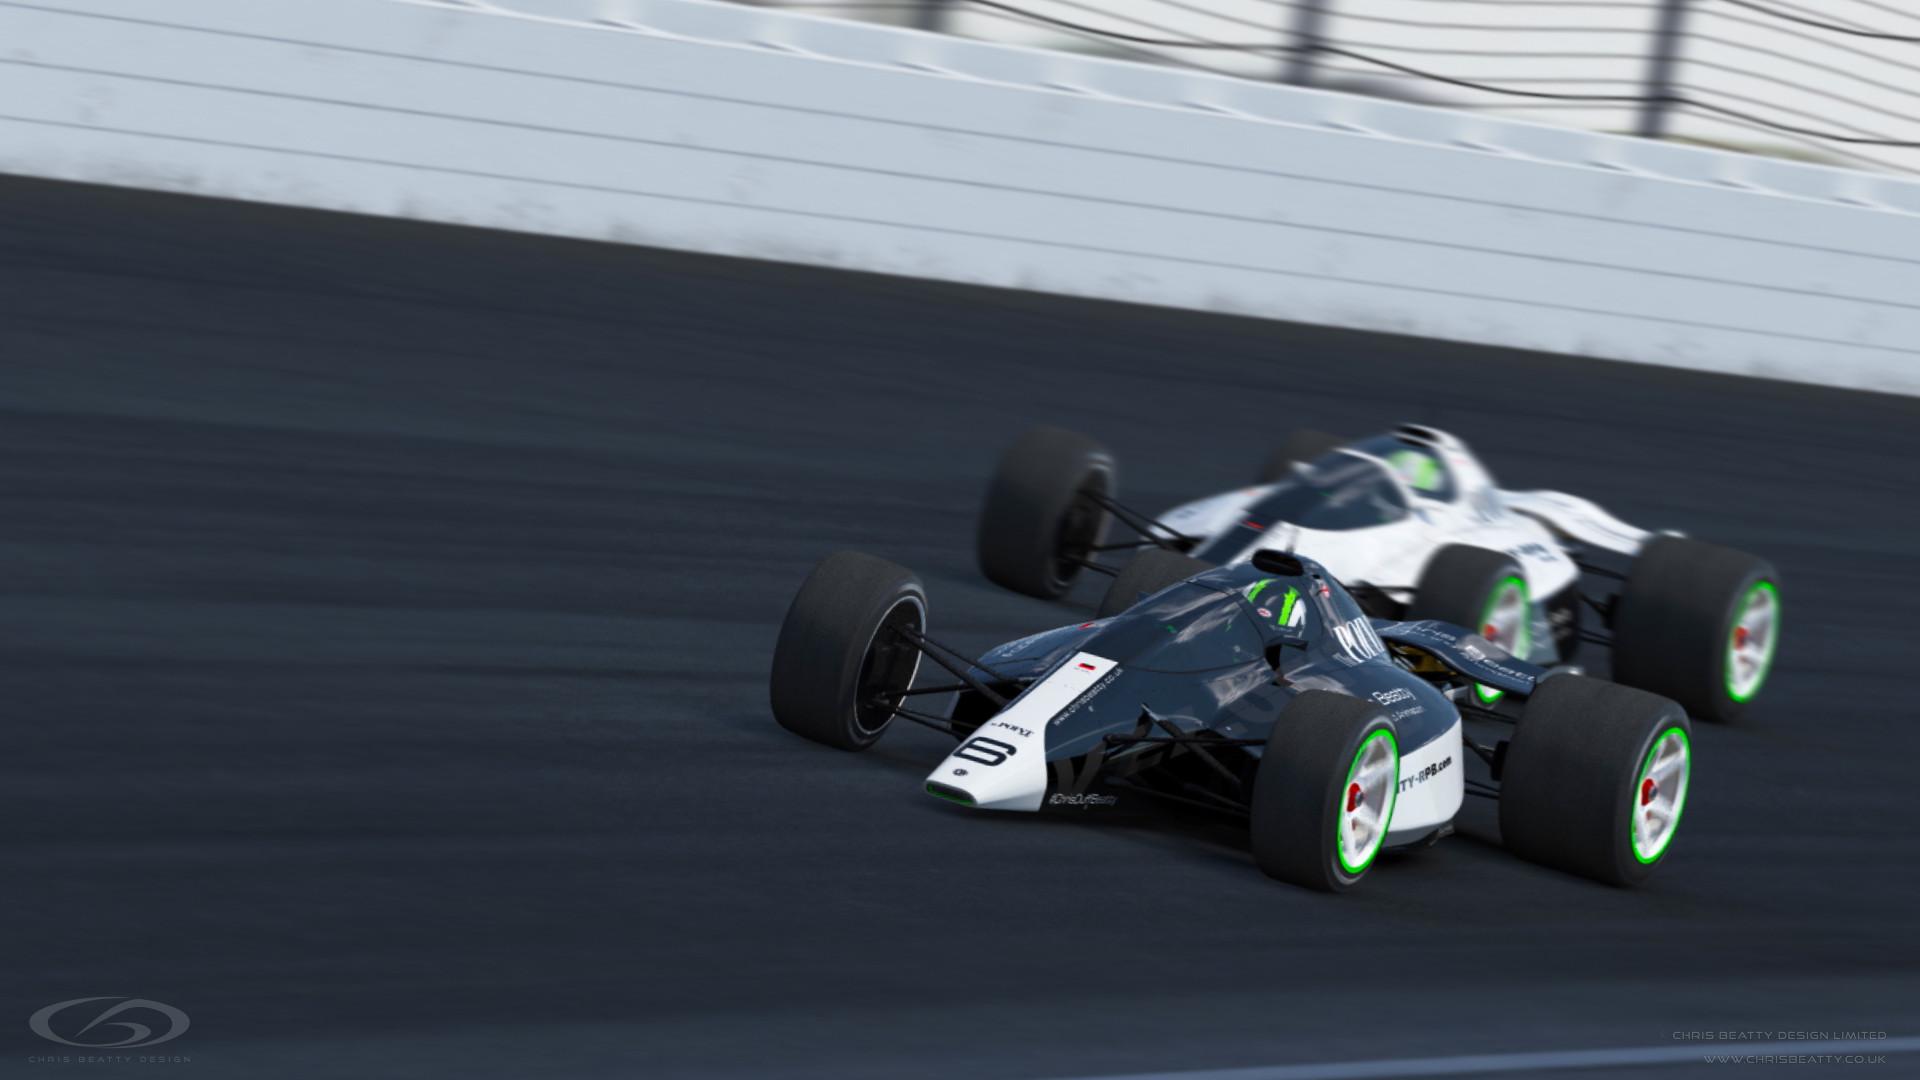 Velocity Concept Car Indy500